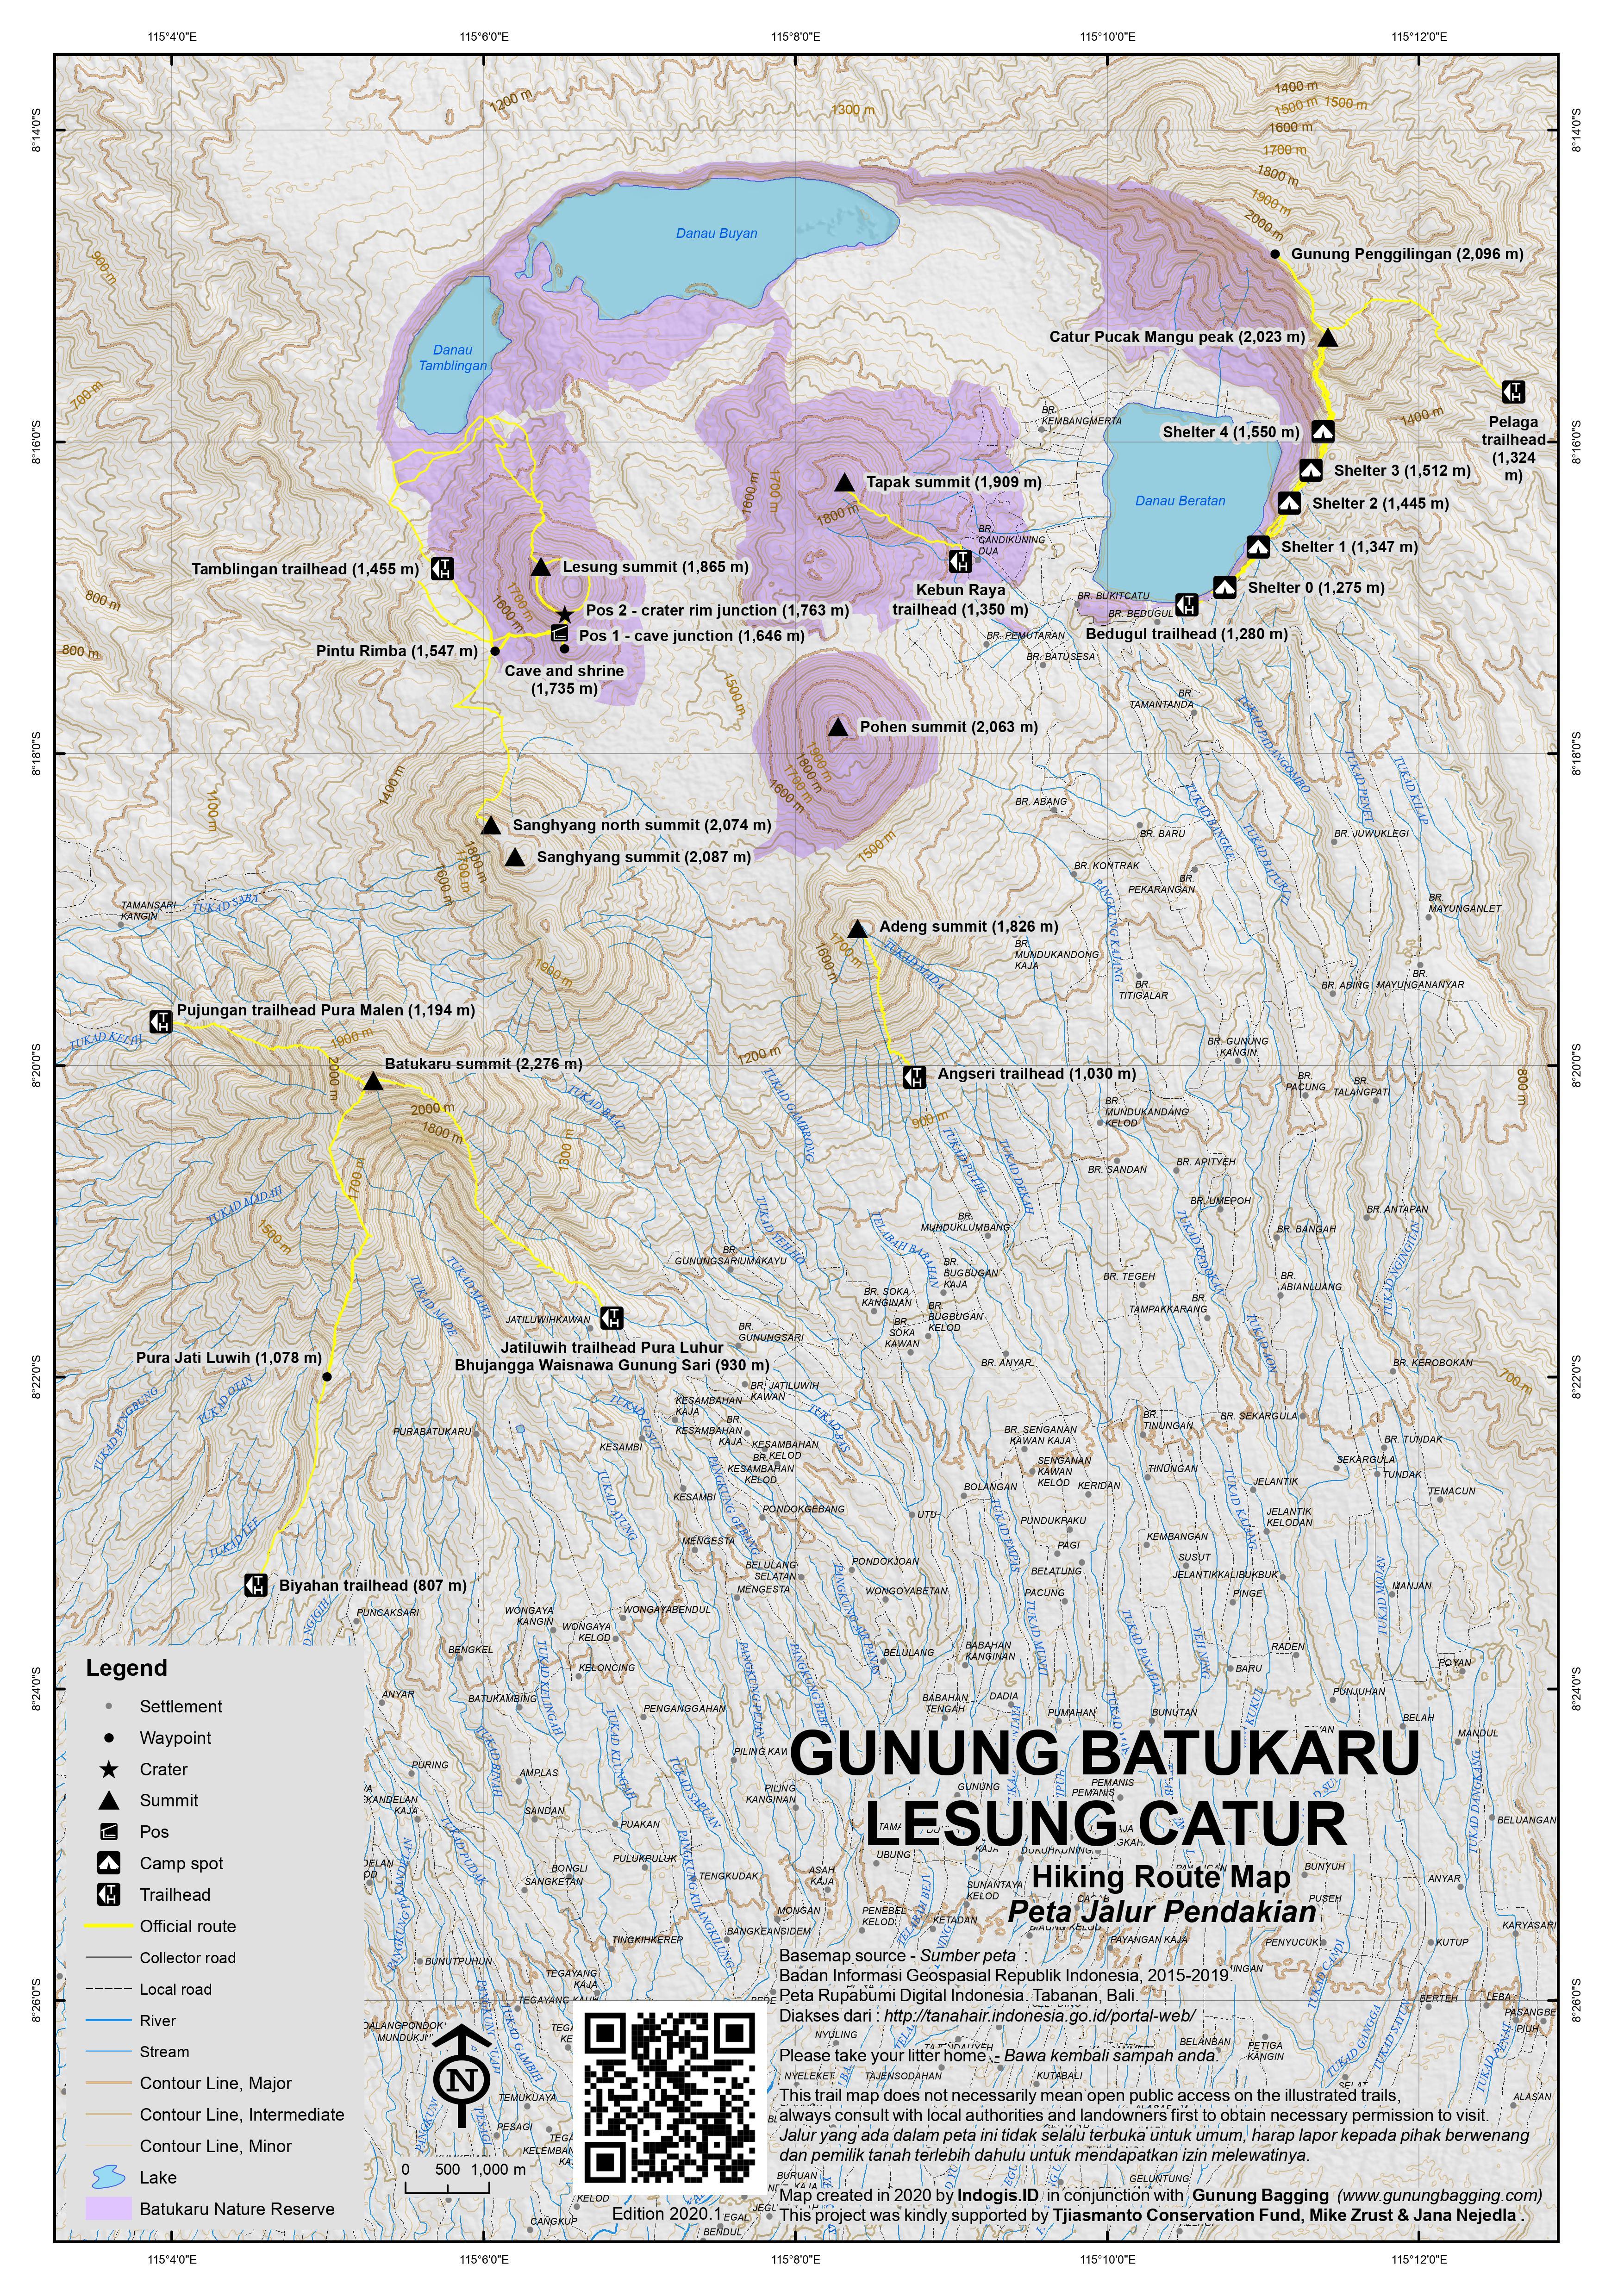 Peta Jalur Pendakian Gunung Batukaru, Lesung and Catur